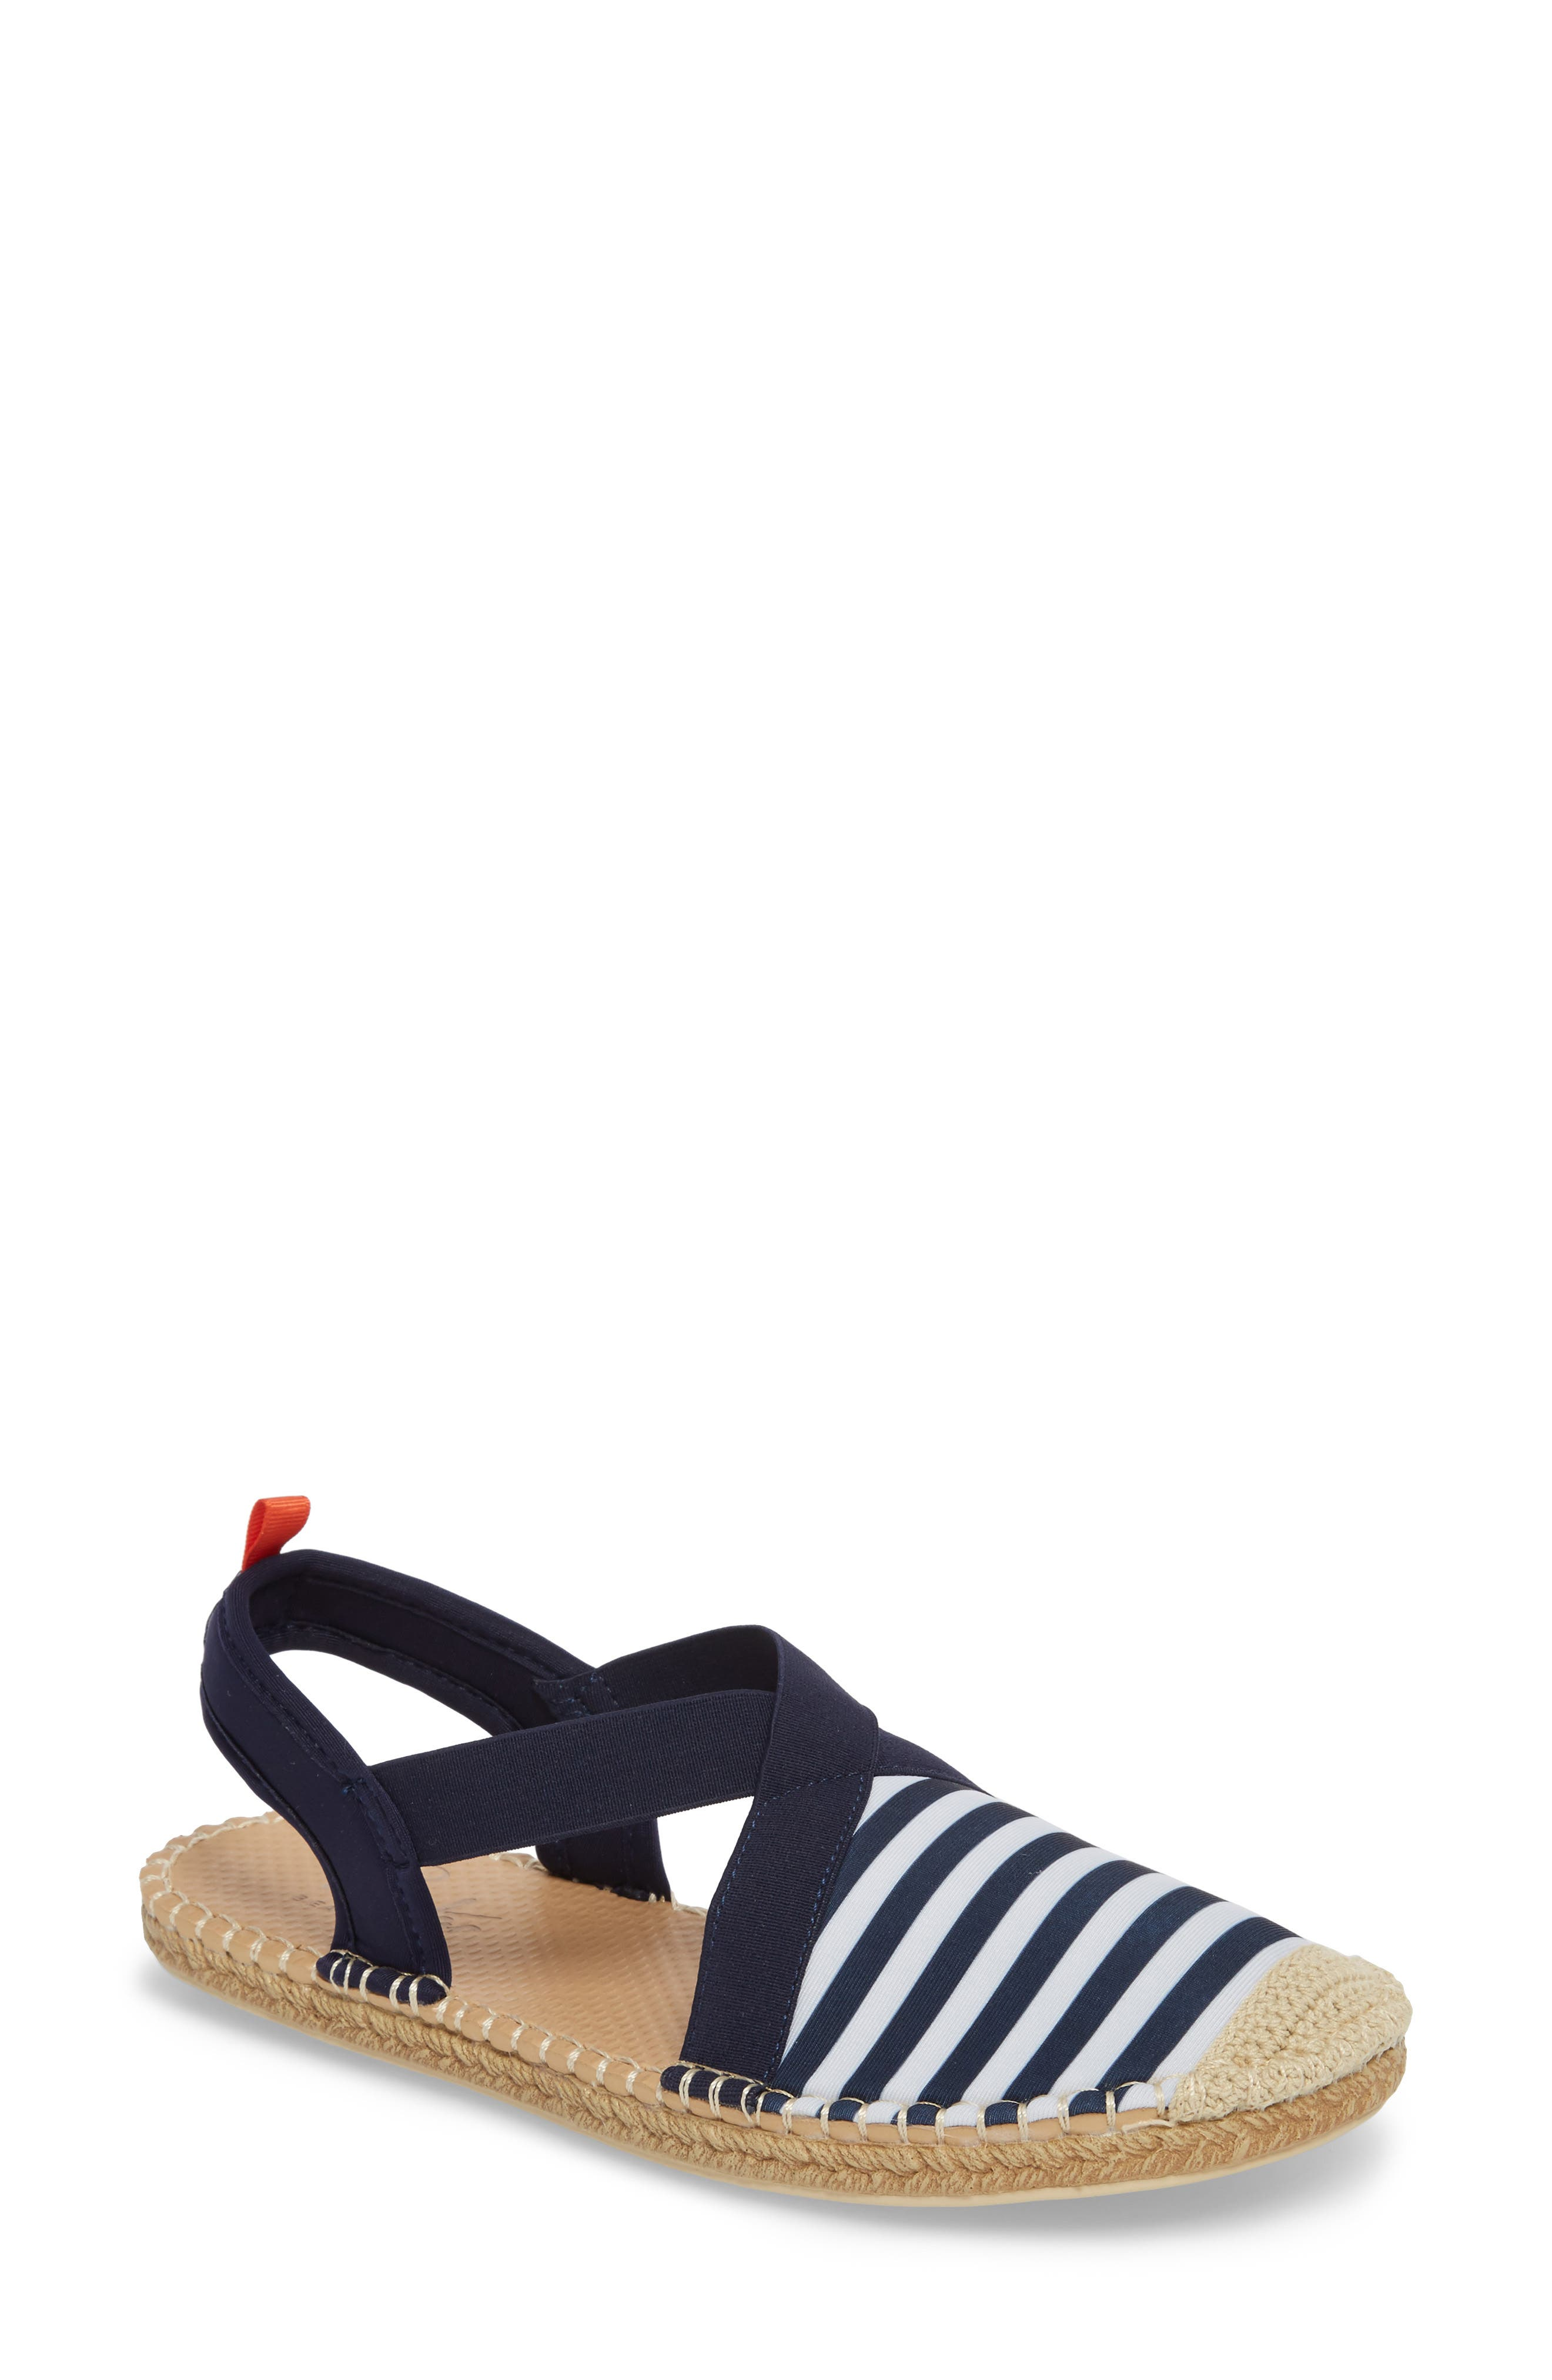 Sea Star Slingback Espadrille Water Shoe,                         Main,                         color, Navy/ White Stripes